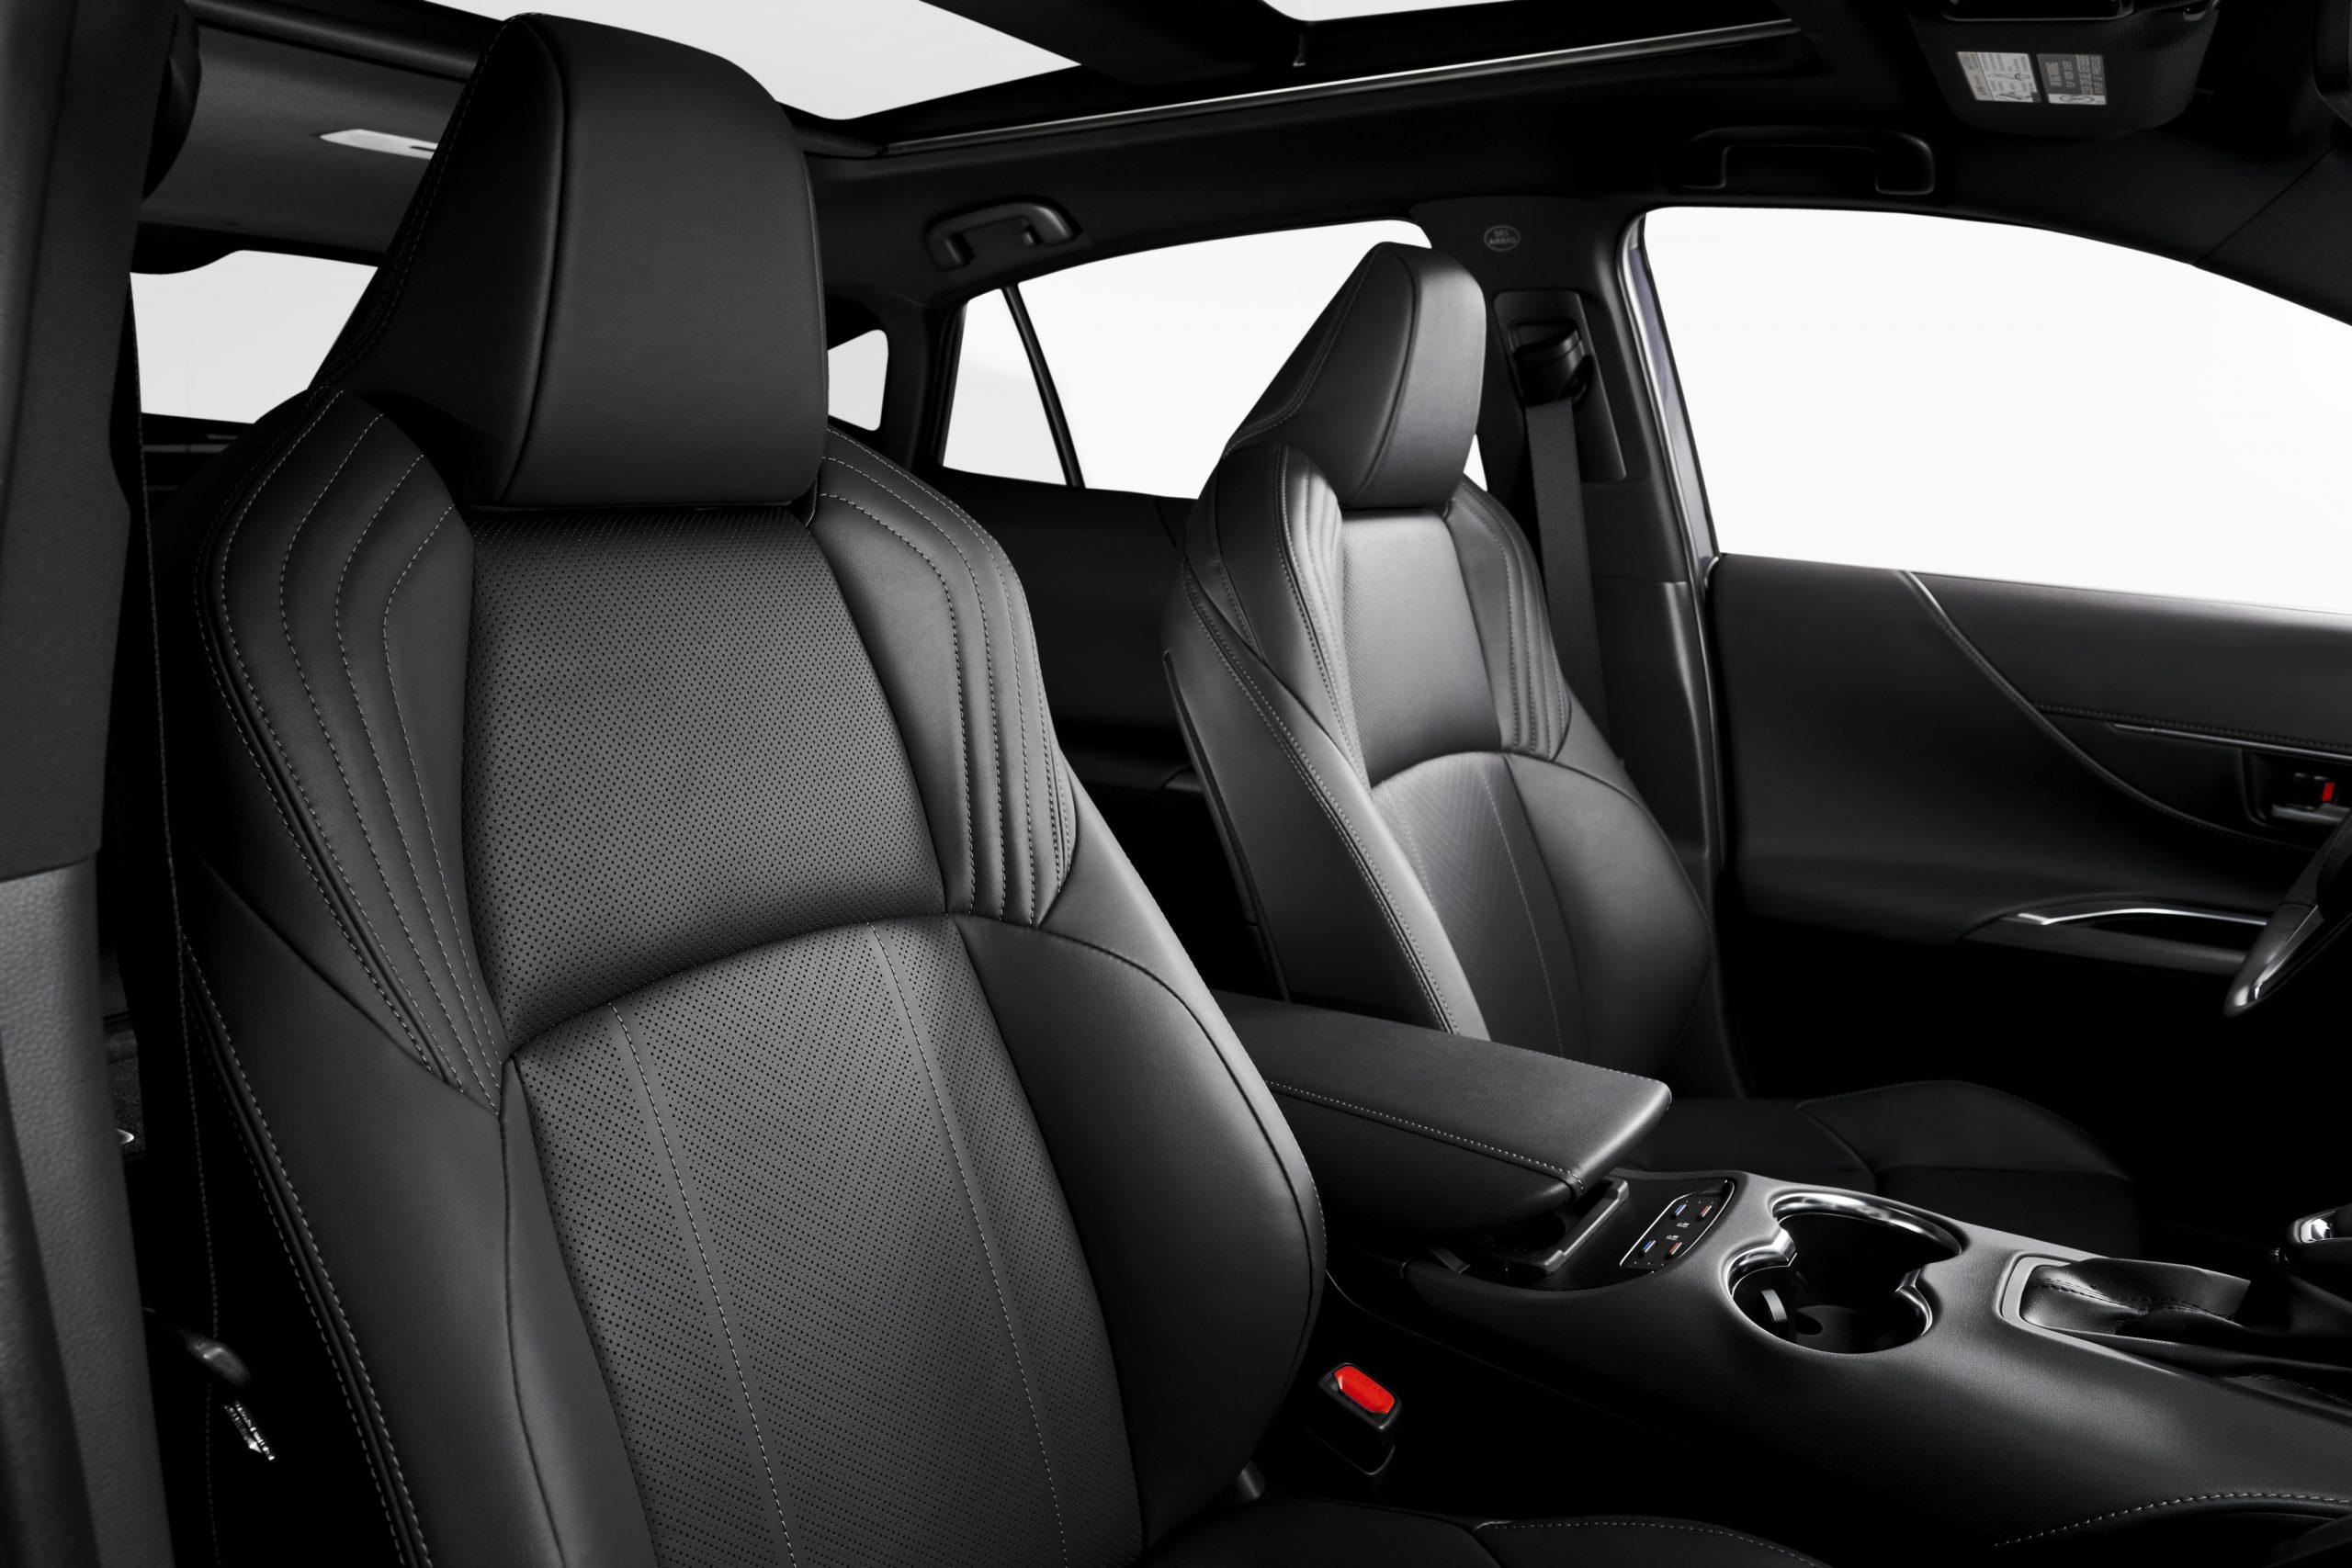 2021-Toyota-Venza_Interior_009-scaled.jpg